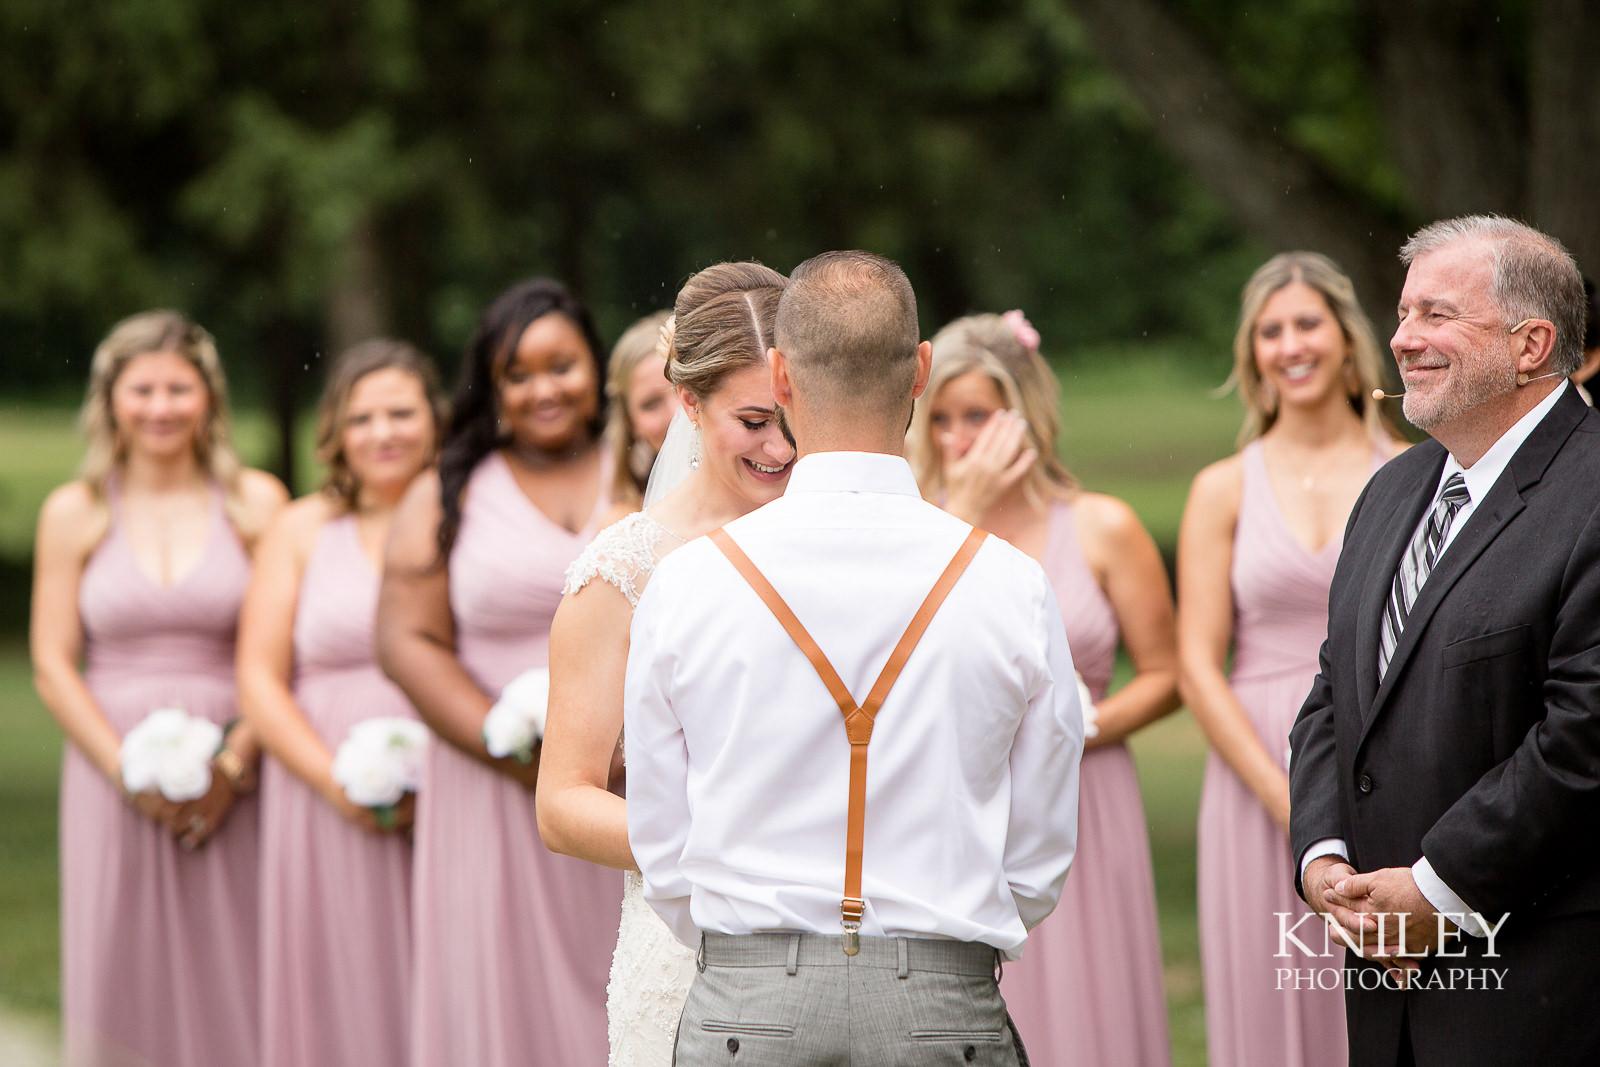 049 - Ontario Golf Club Wedding Pictures - IMG_7696.jpg